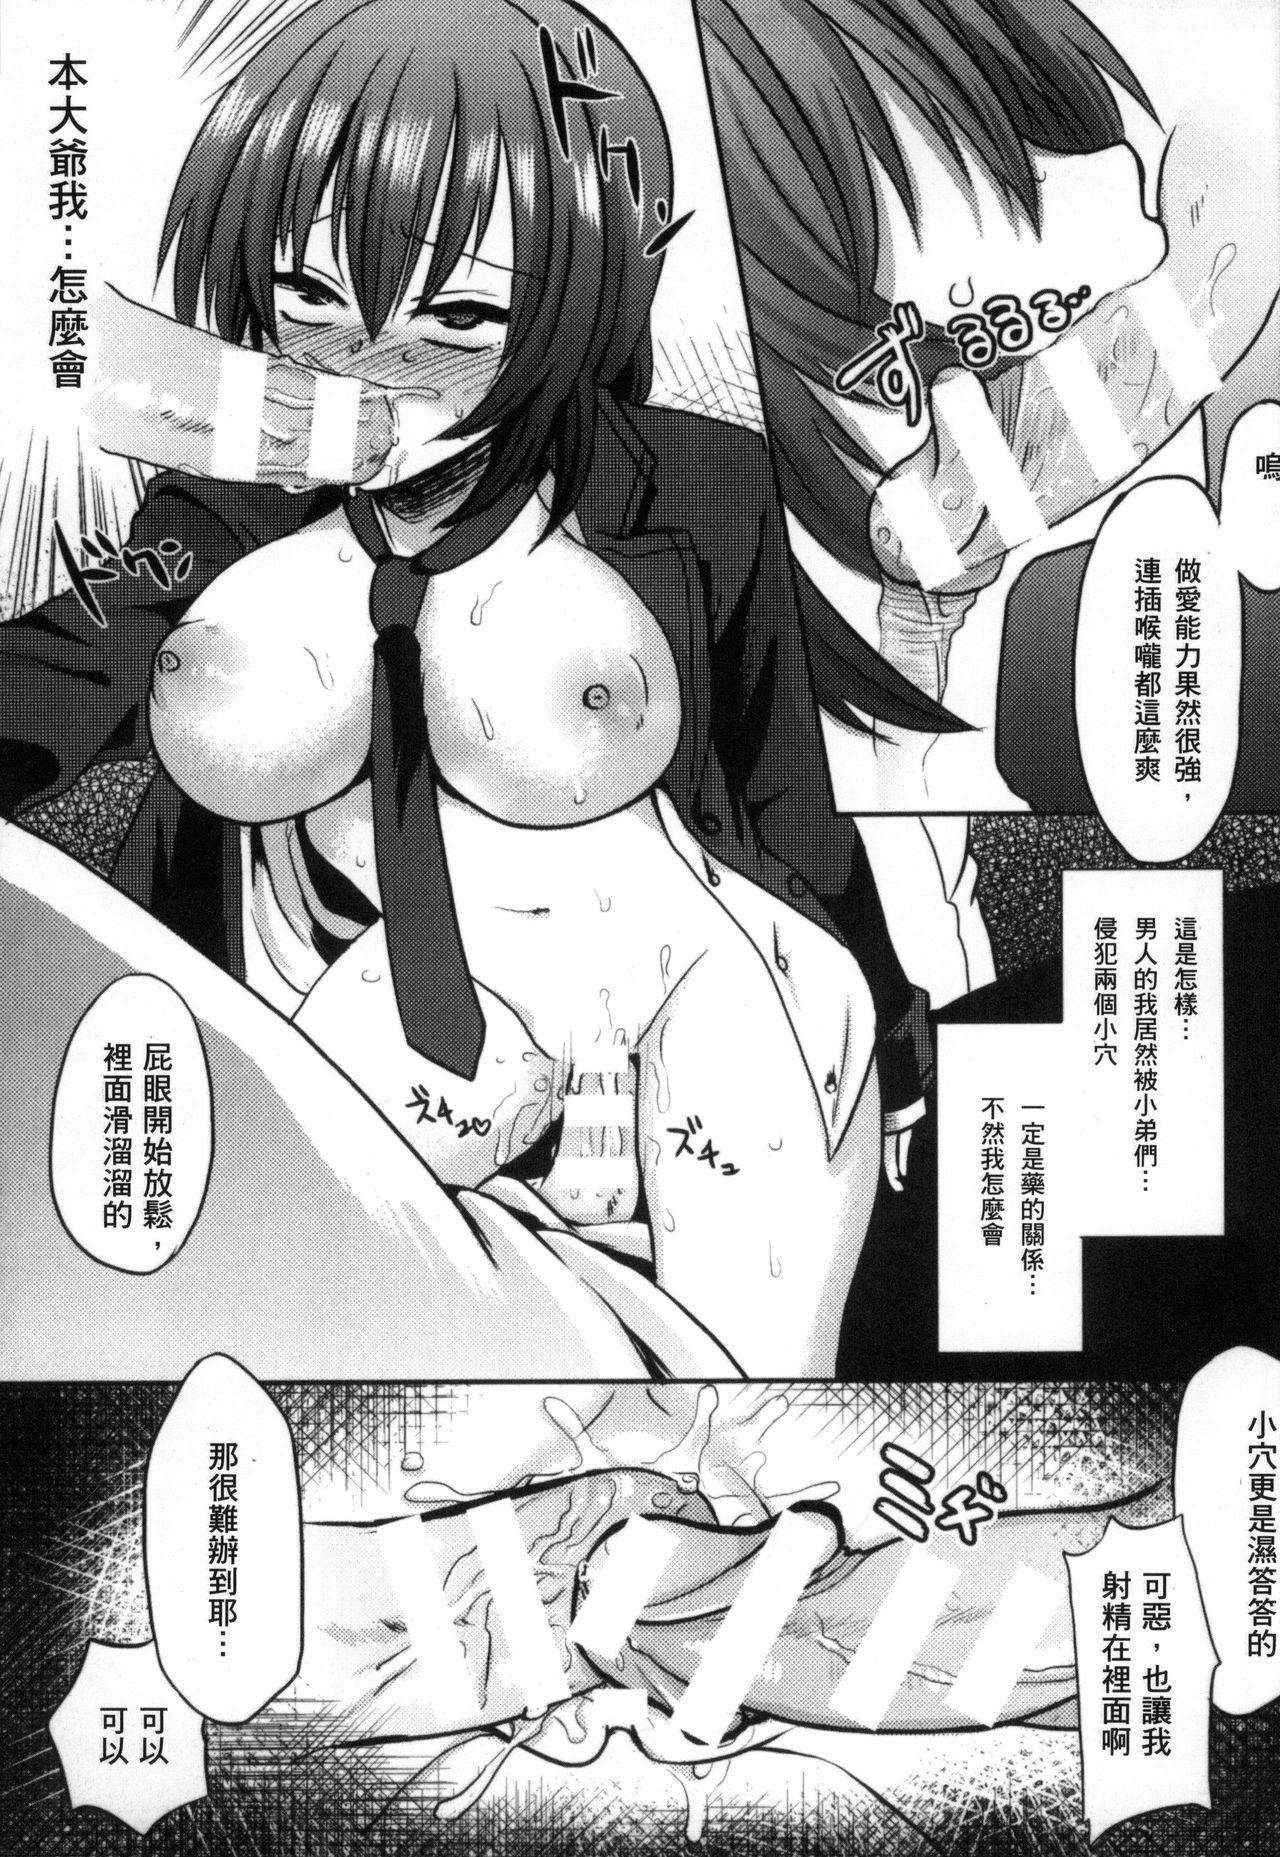 2D Comic Magazine Seitenkan Shite Haramasarete Botebara End! | 性轉換與懷孕,滿腹精液收場! 121